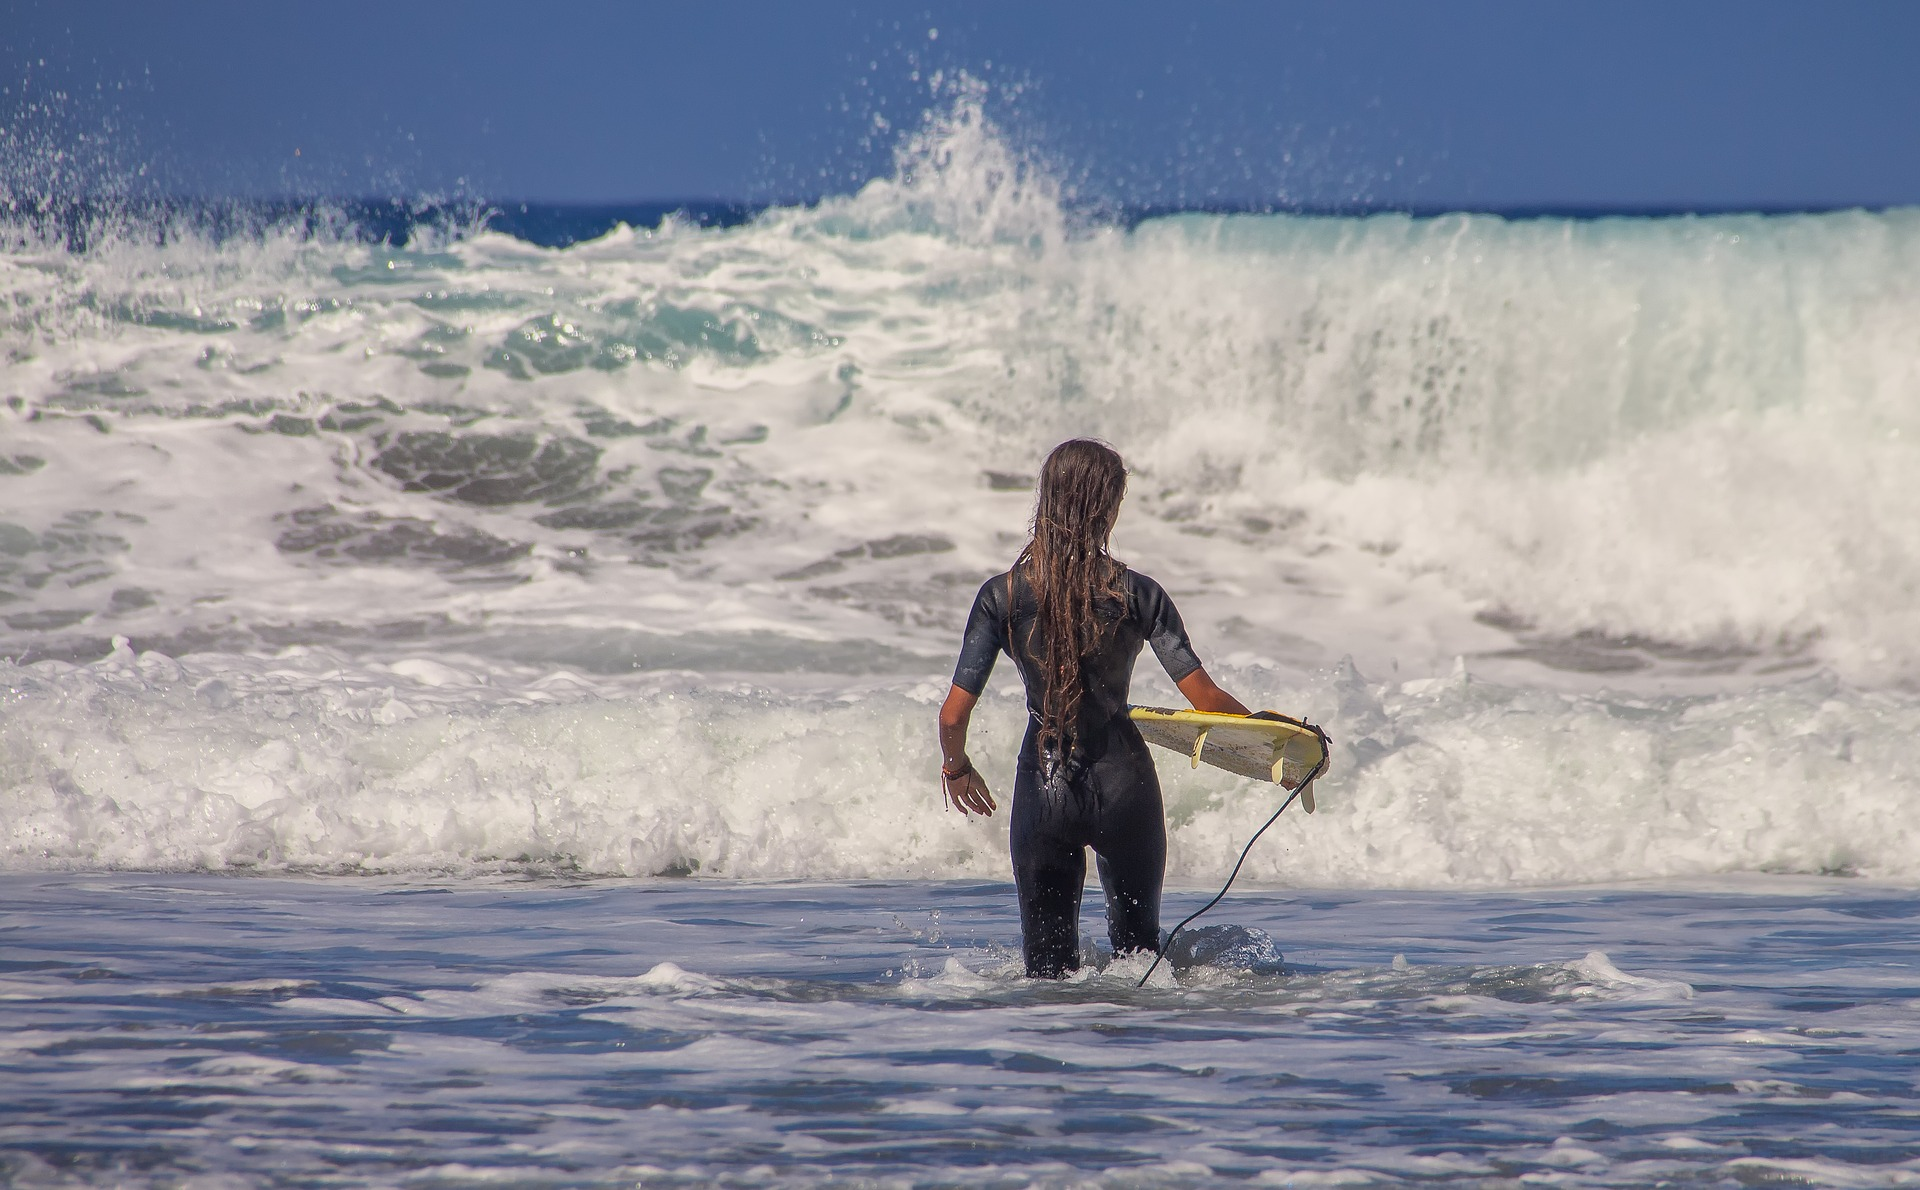 surfer-3729052_1920.jpg